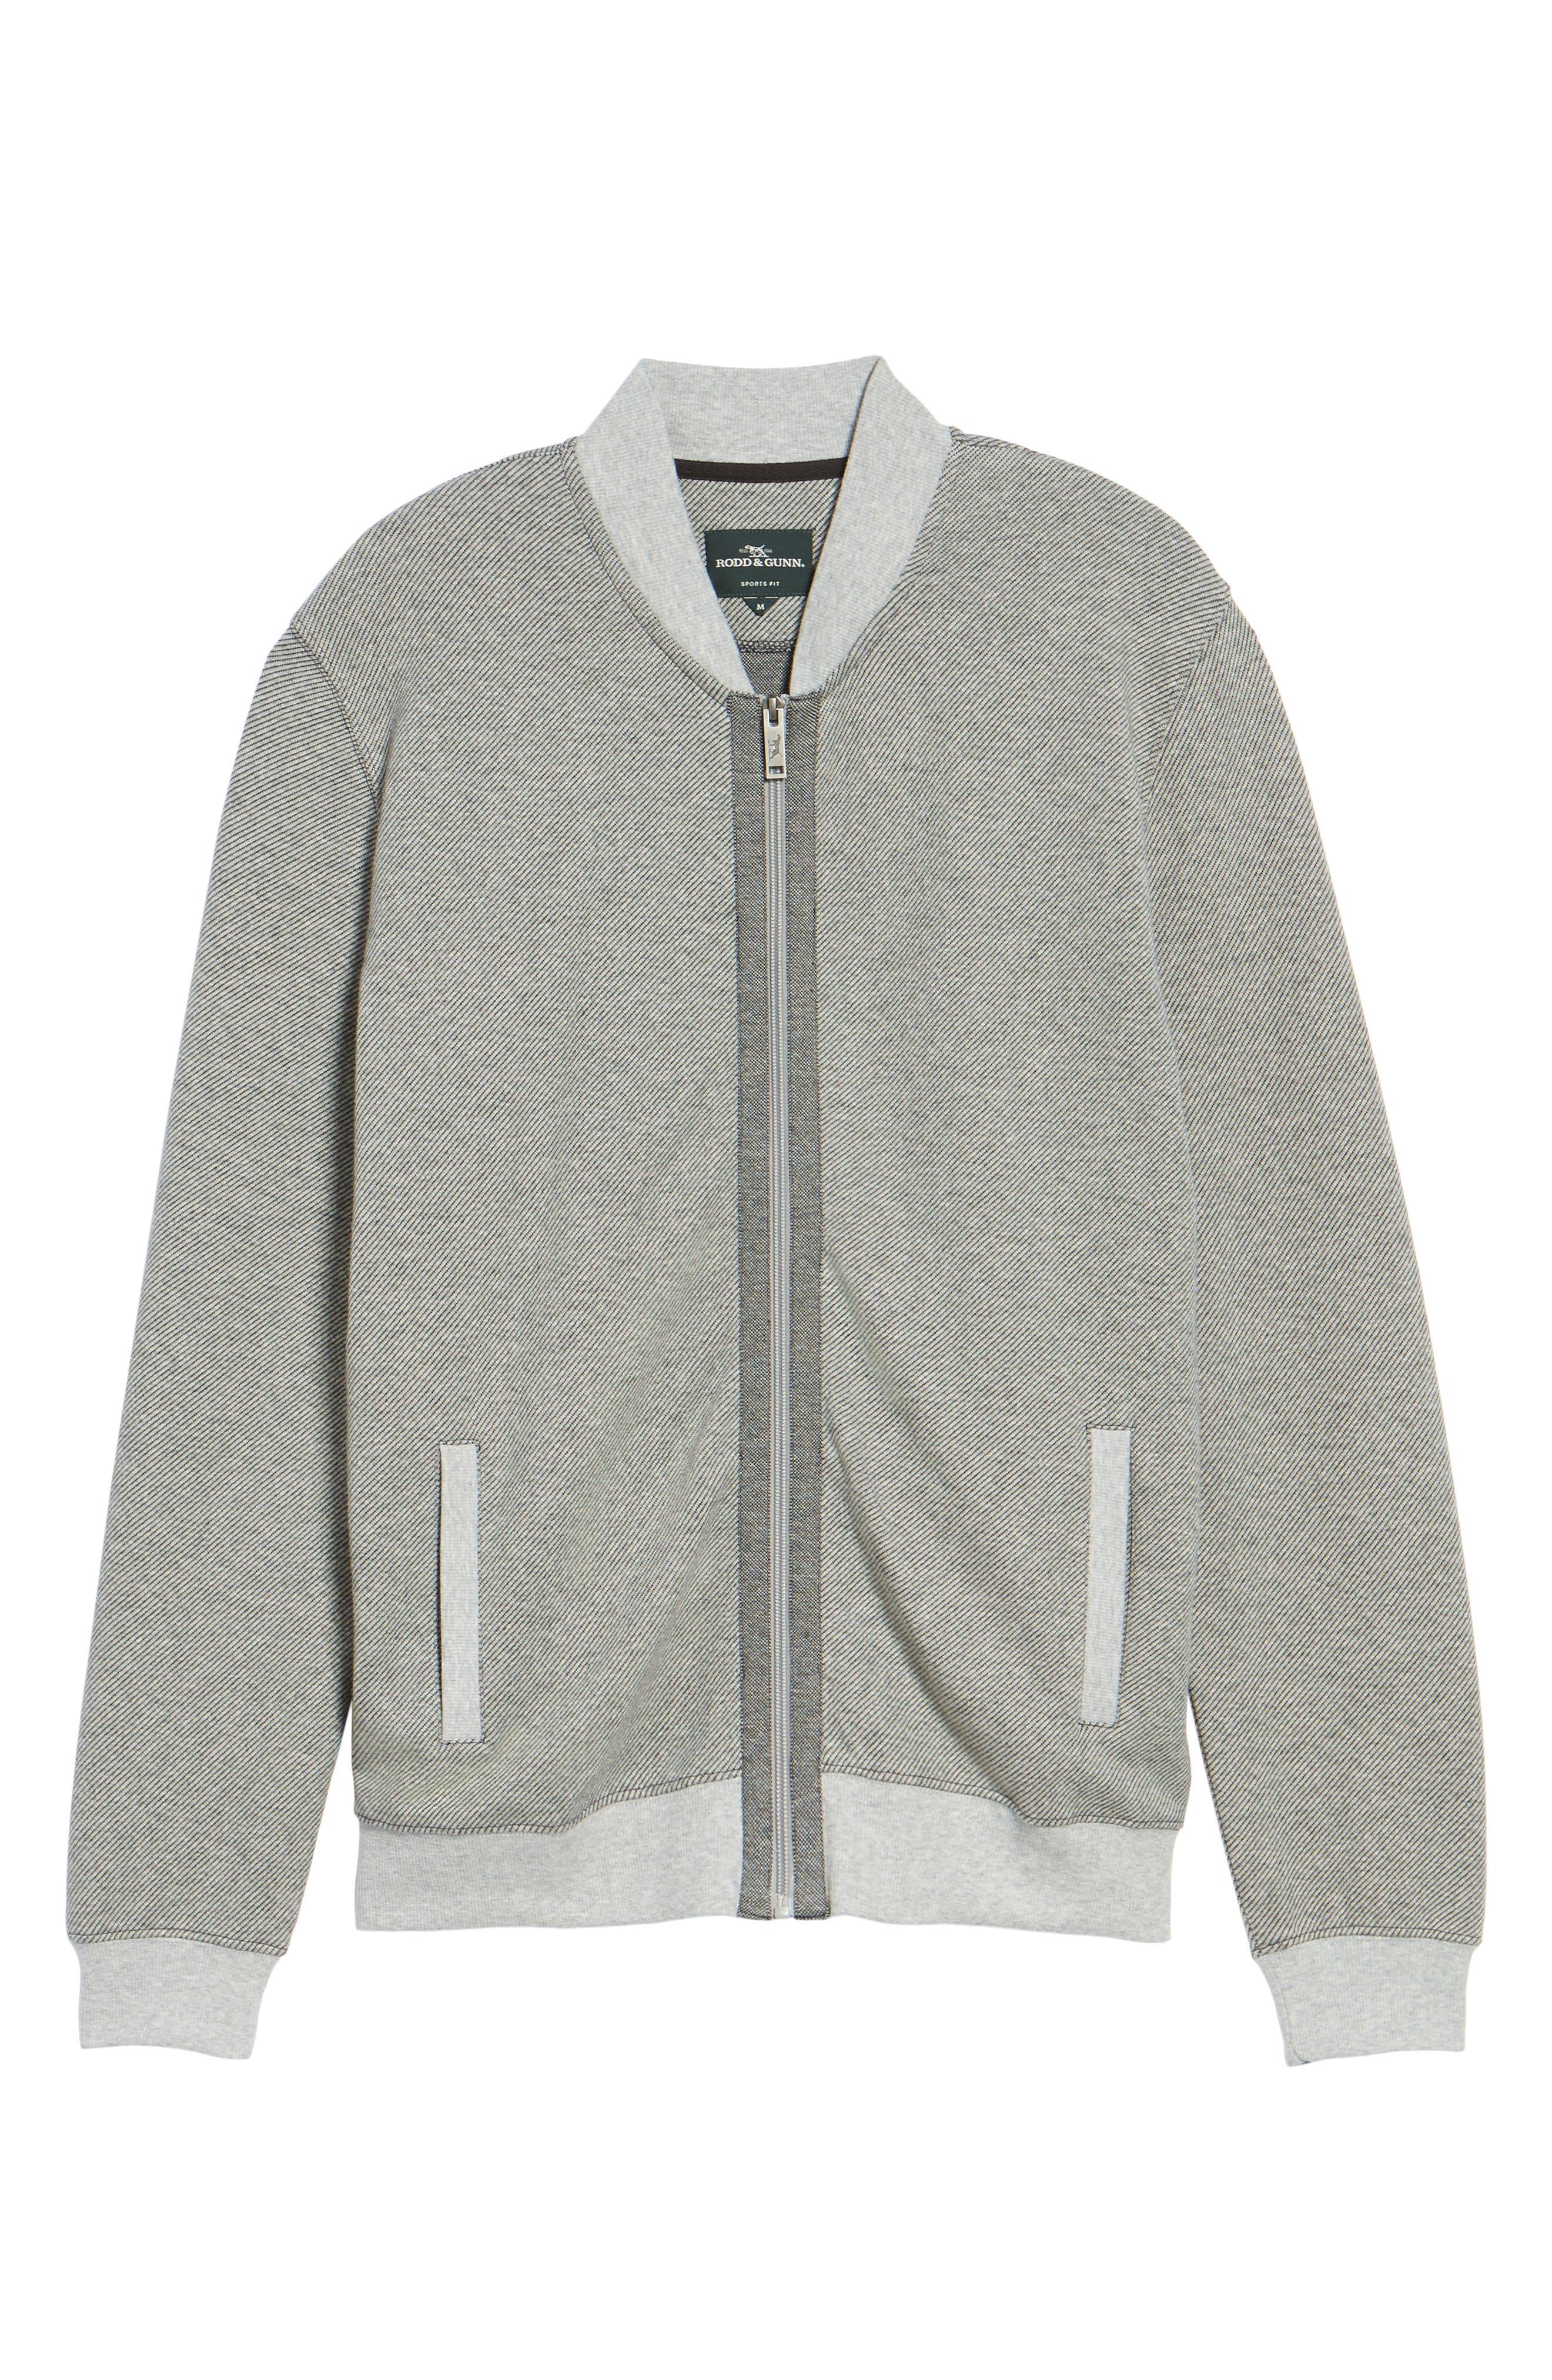 Alderson Ave Fleece Jacket,                             Alternate thumbnail 6, color,                             020